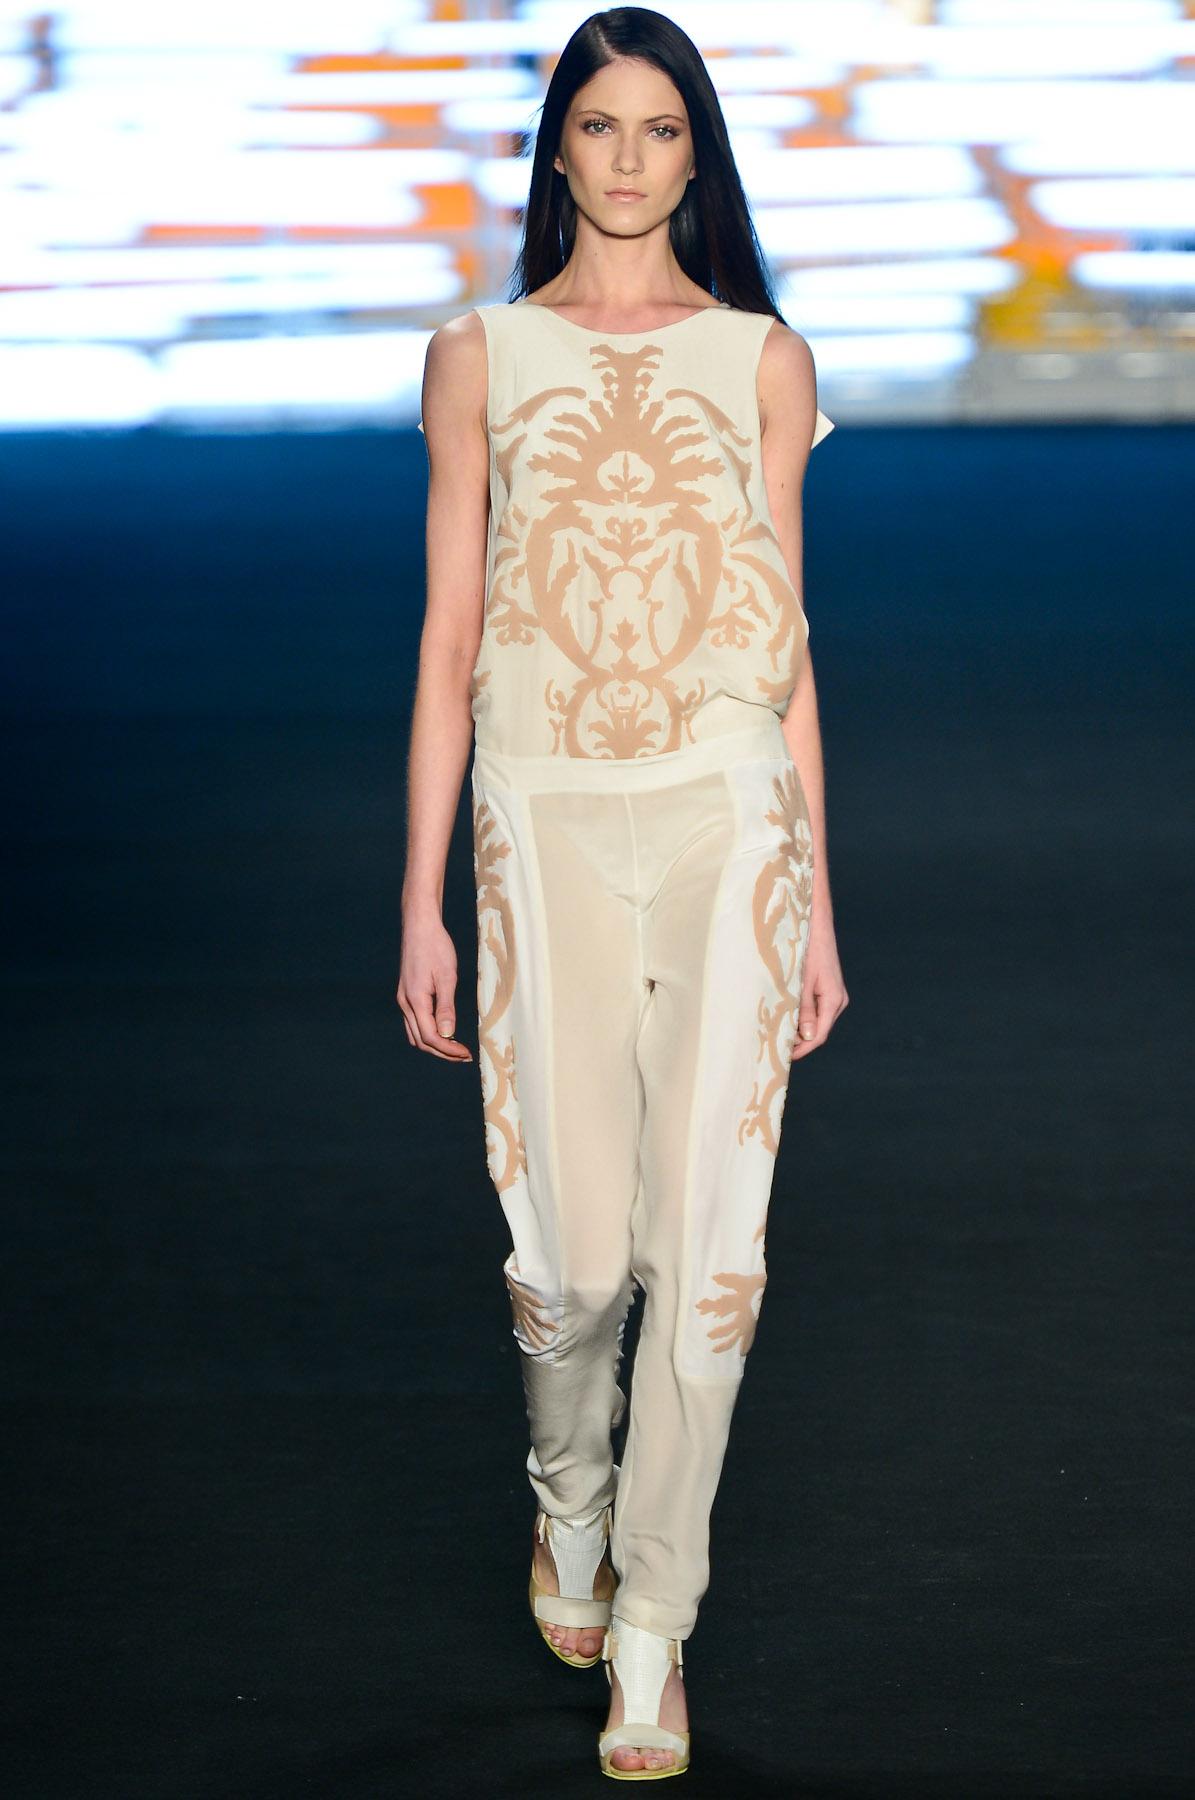 desfile-espaco-fashion-fashionrio-verao2013-1001.jpg